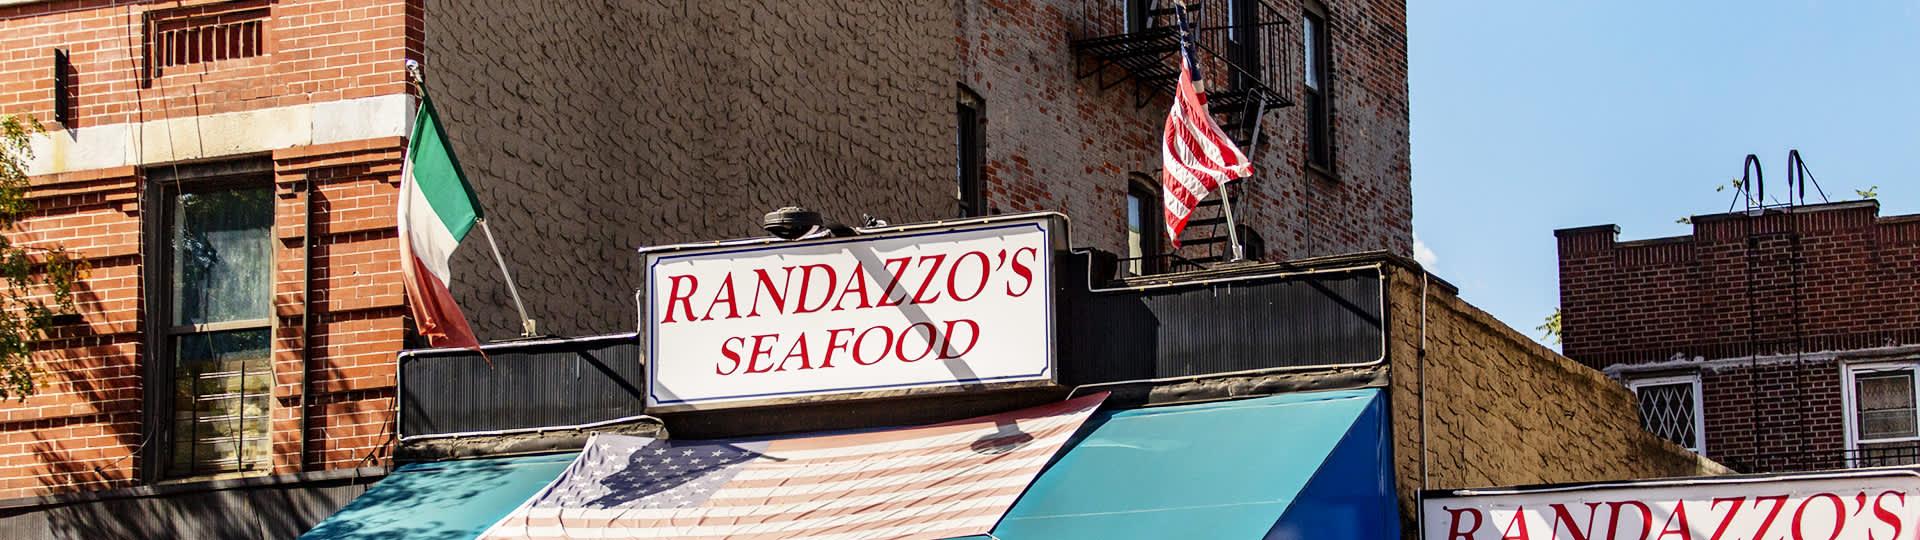 Arthur Ave, Belmont, Bronx, Randazzo's Seafood